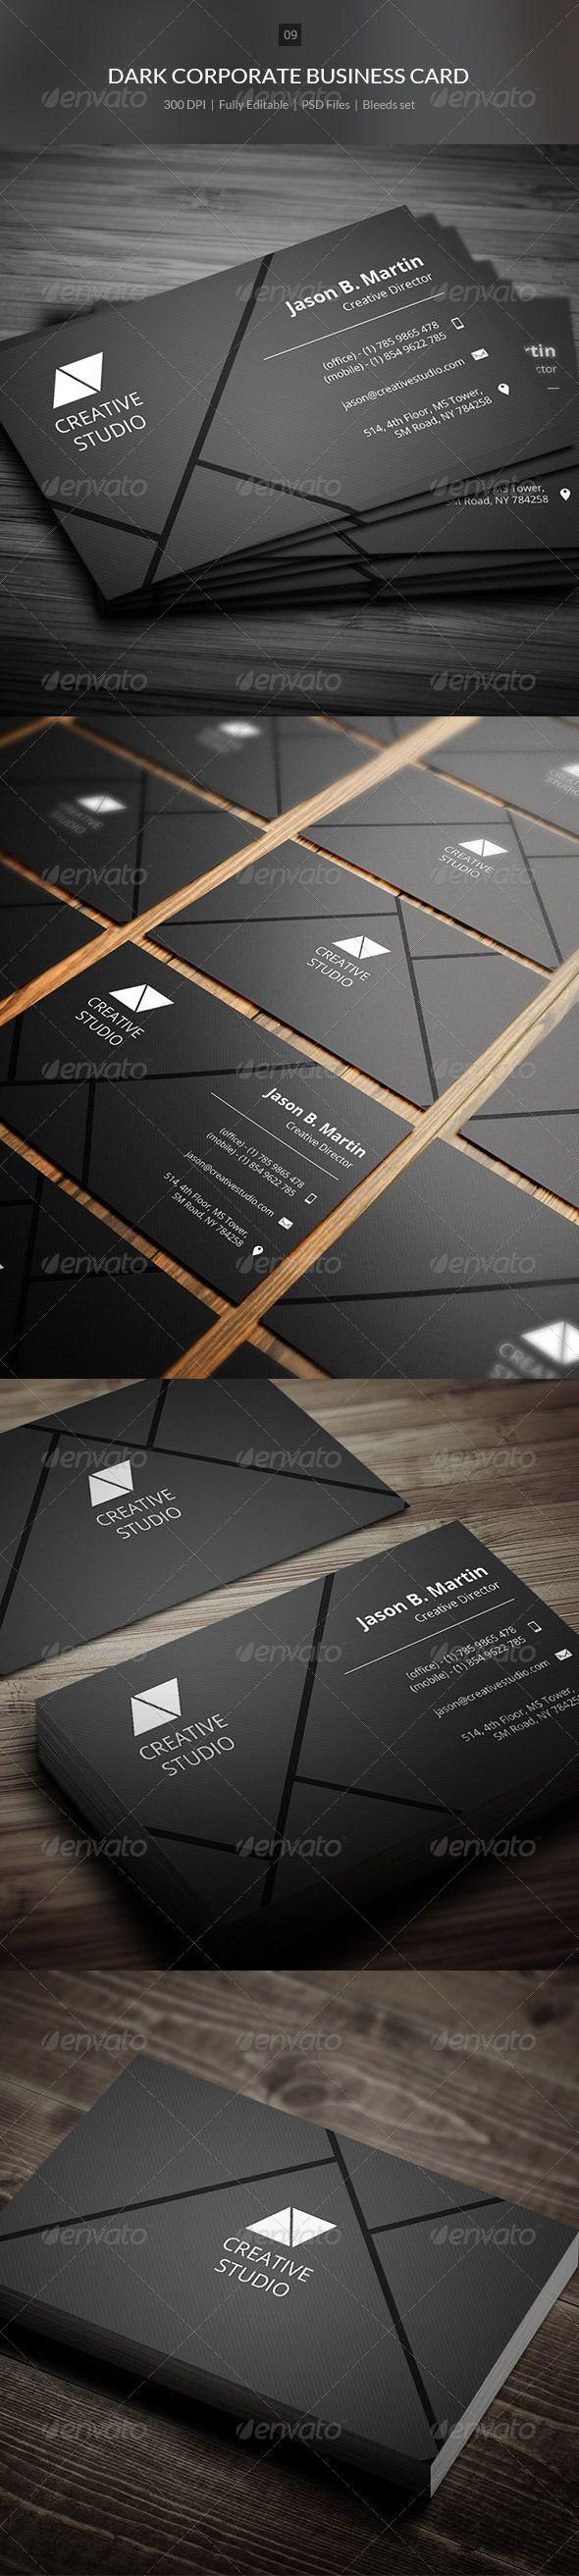 Dark Corporate Business Card - 09 - Corporate Business Cards